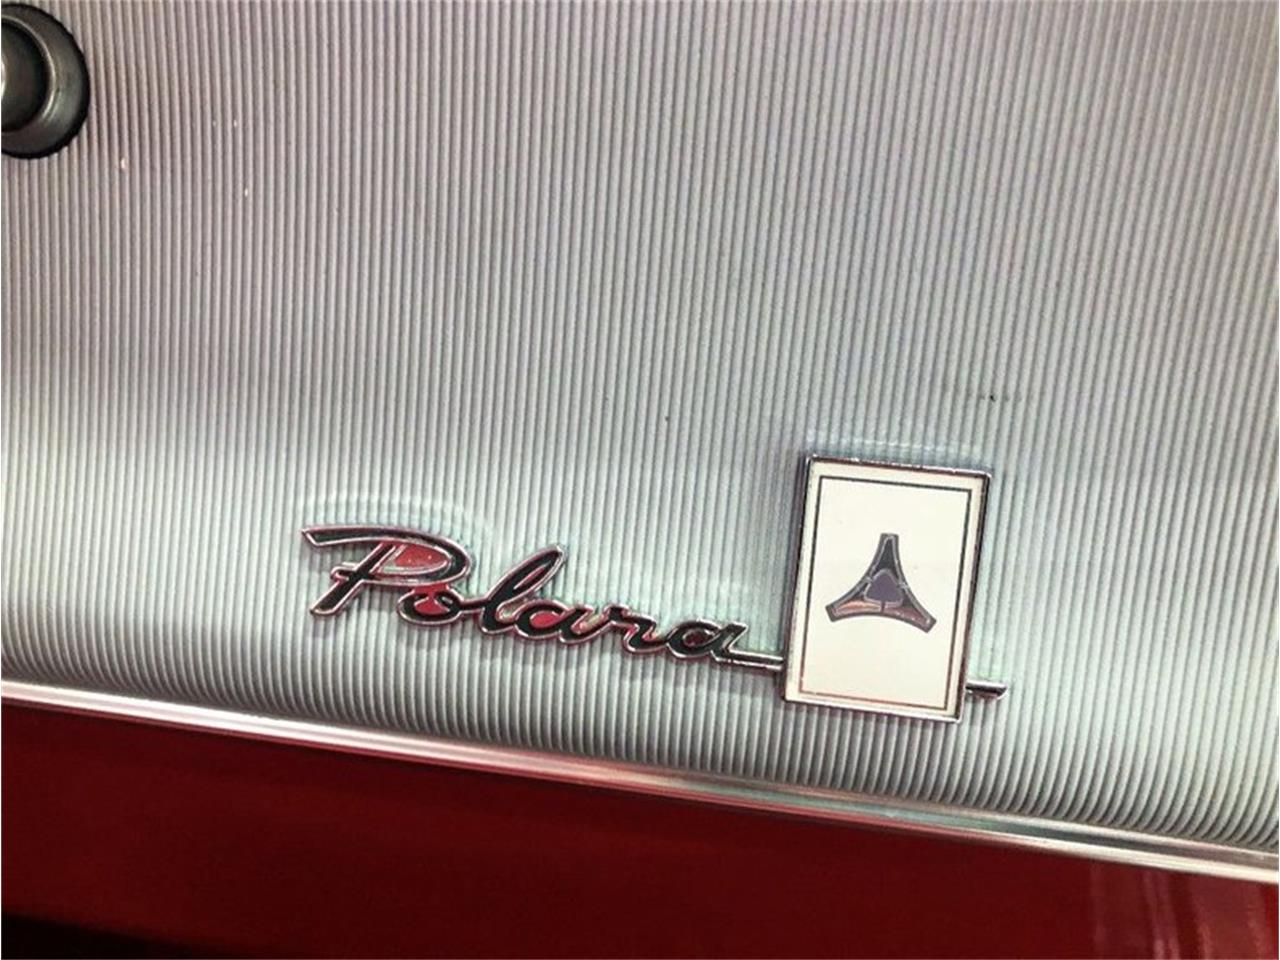 1964 Dodge Polara (CC-1413287) for sale in Punta Gorda, Florida